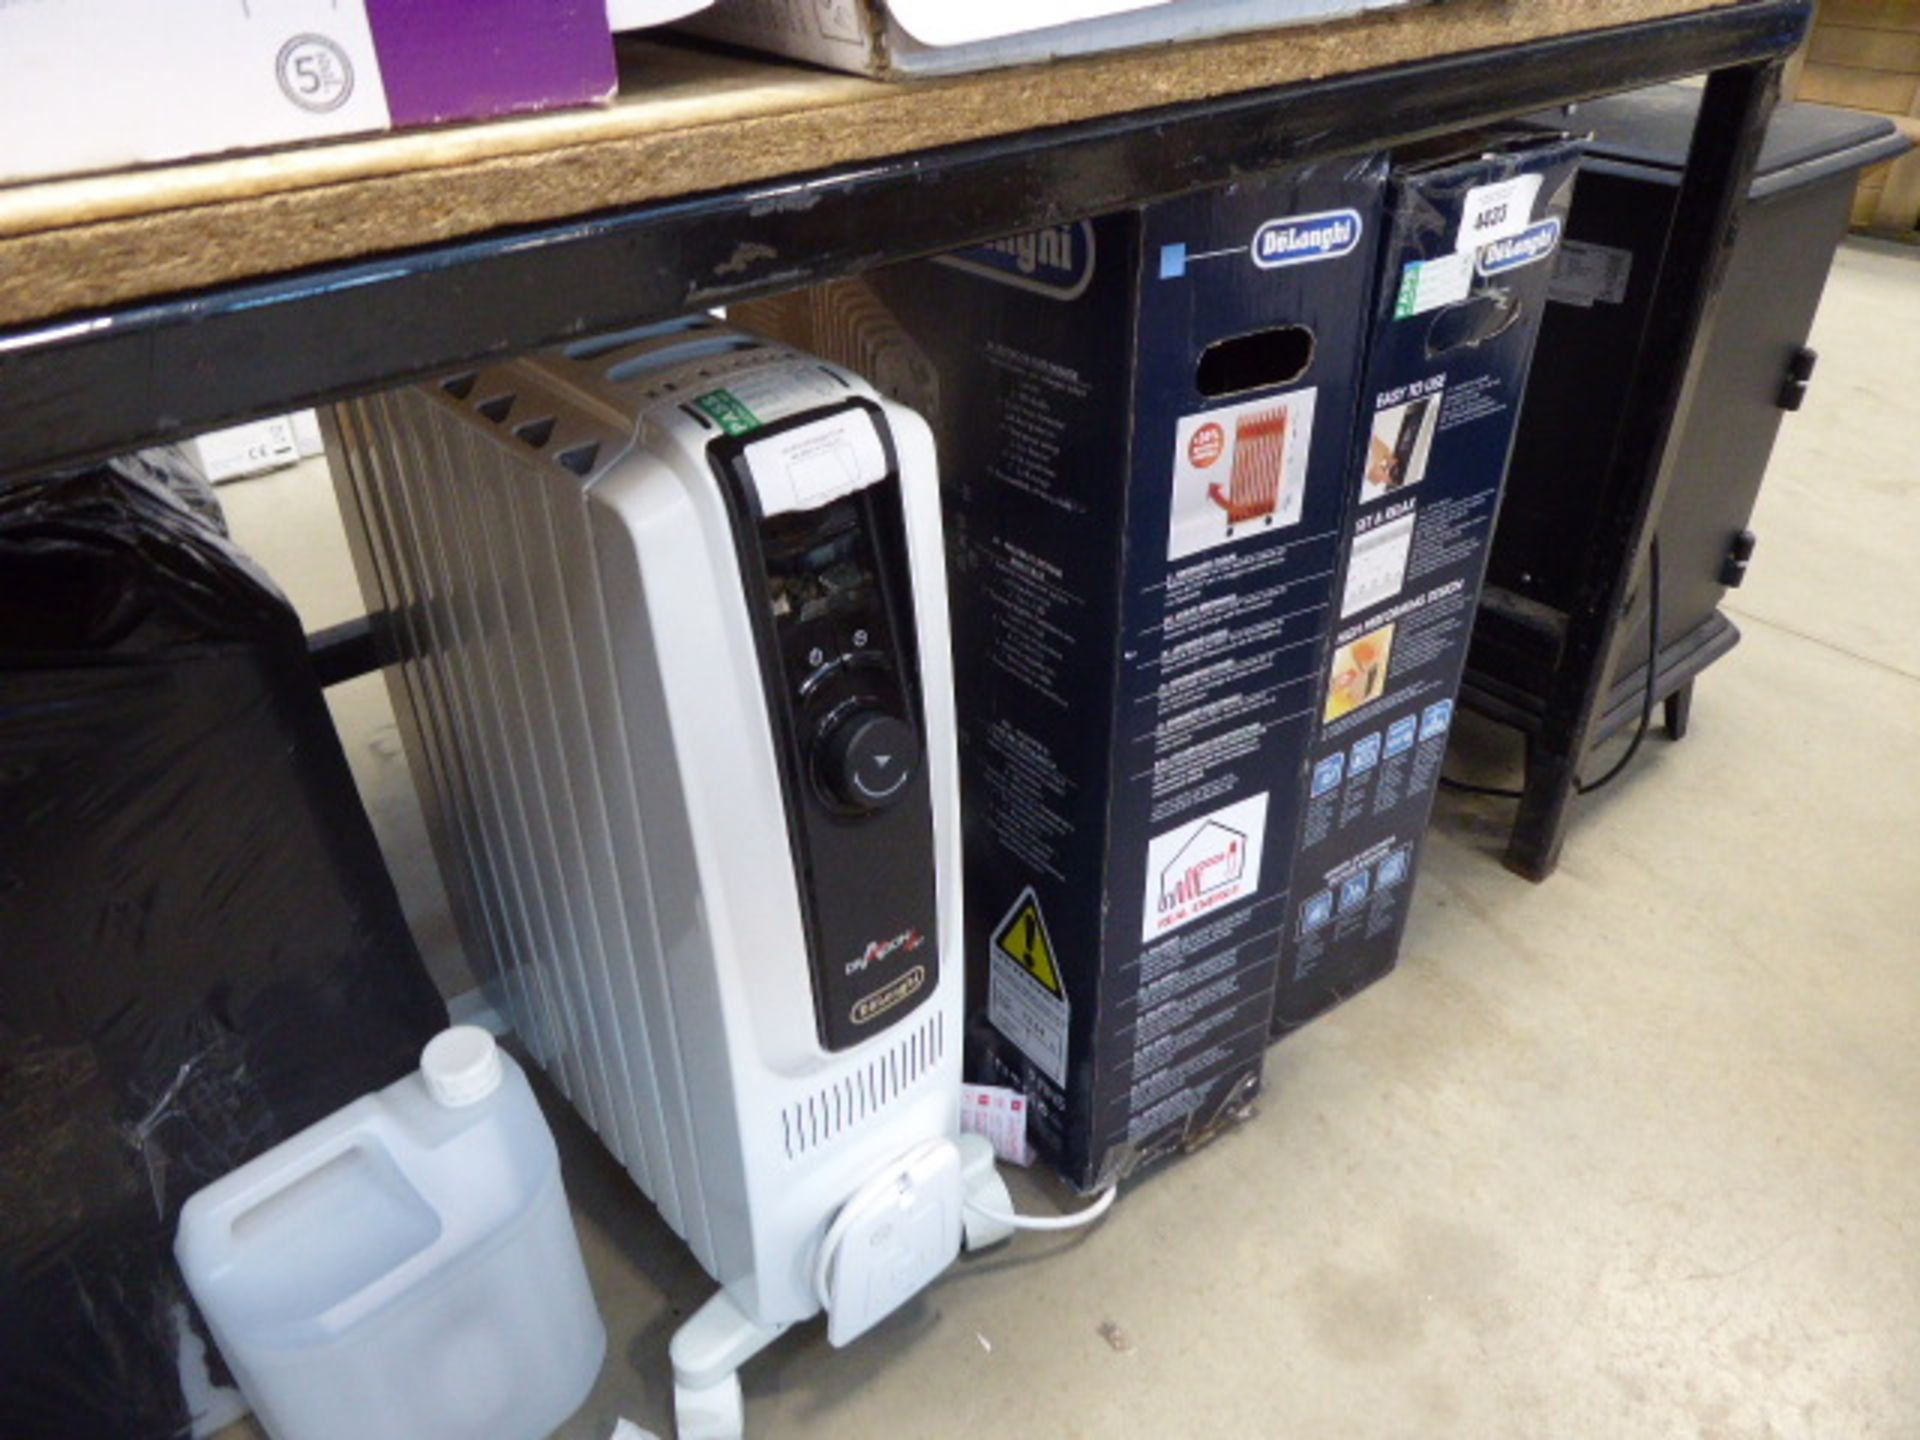 3 De'Longhi oil filled radiators (2 boxed, 1 unboxed)